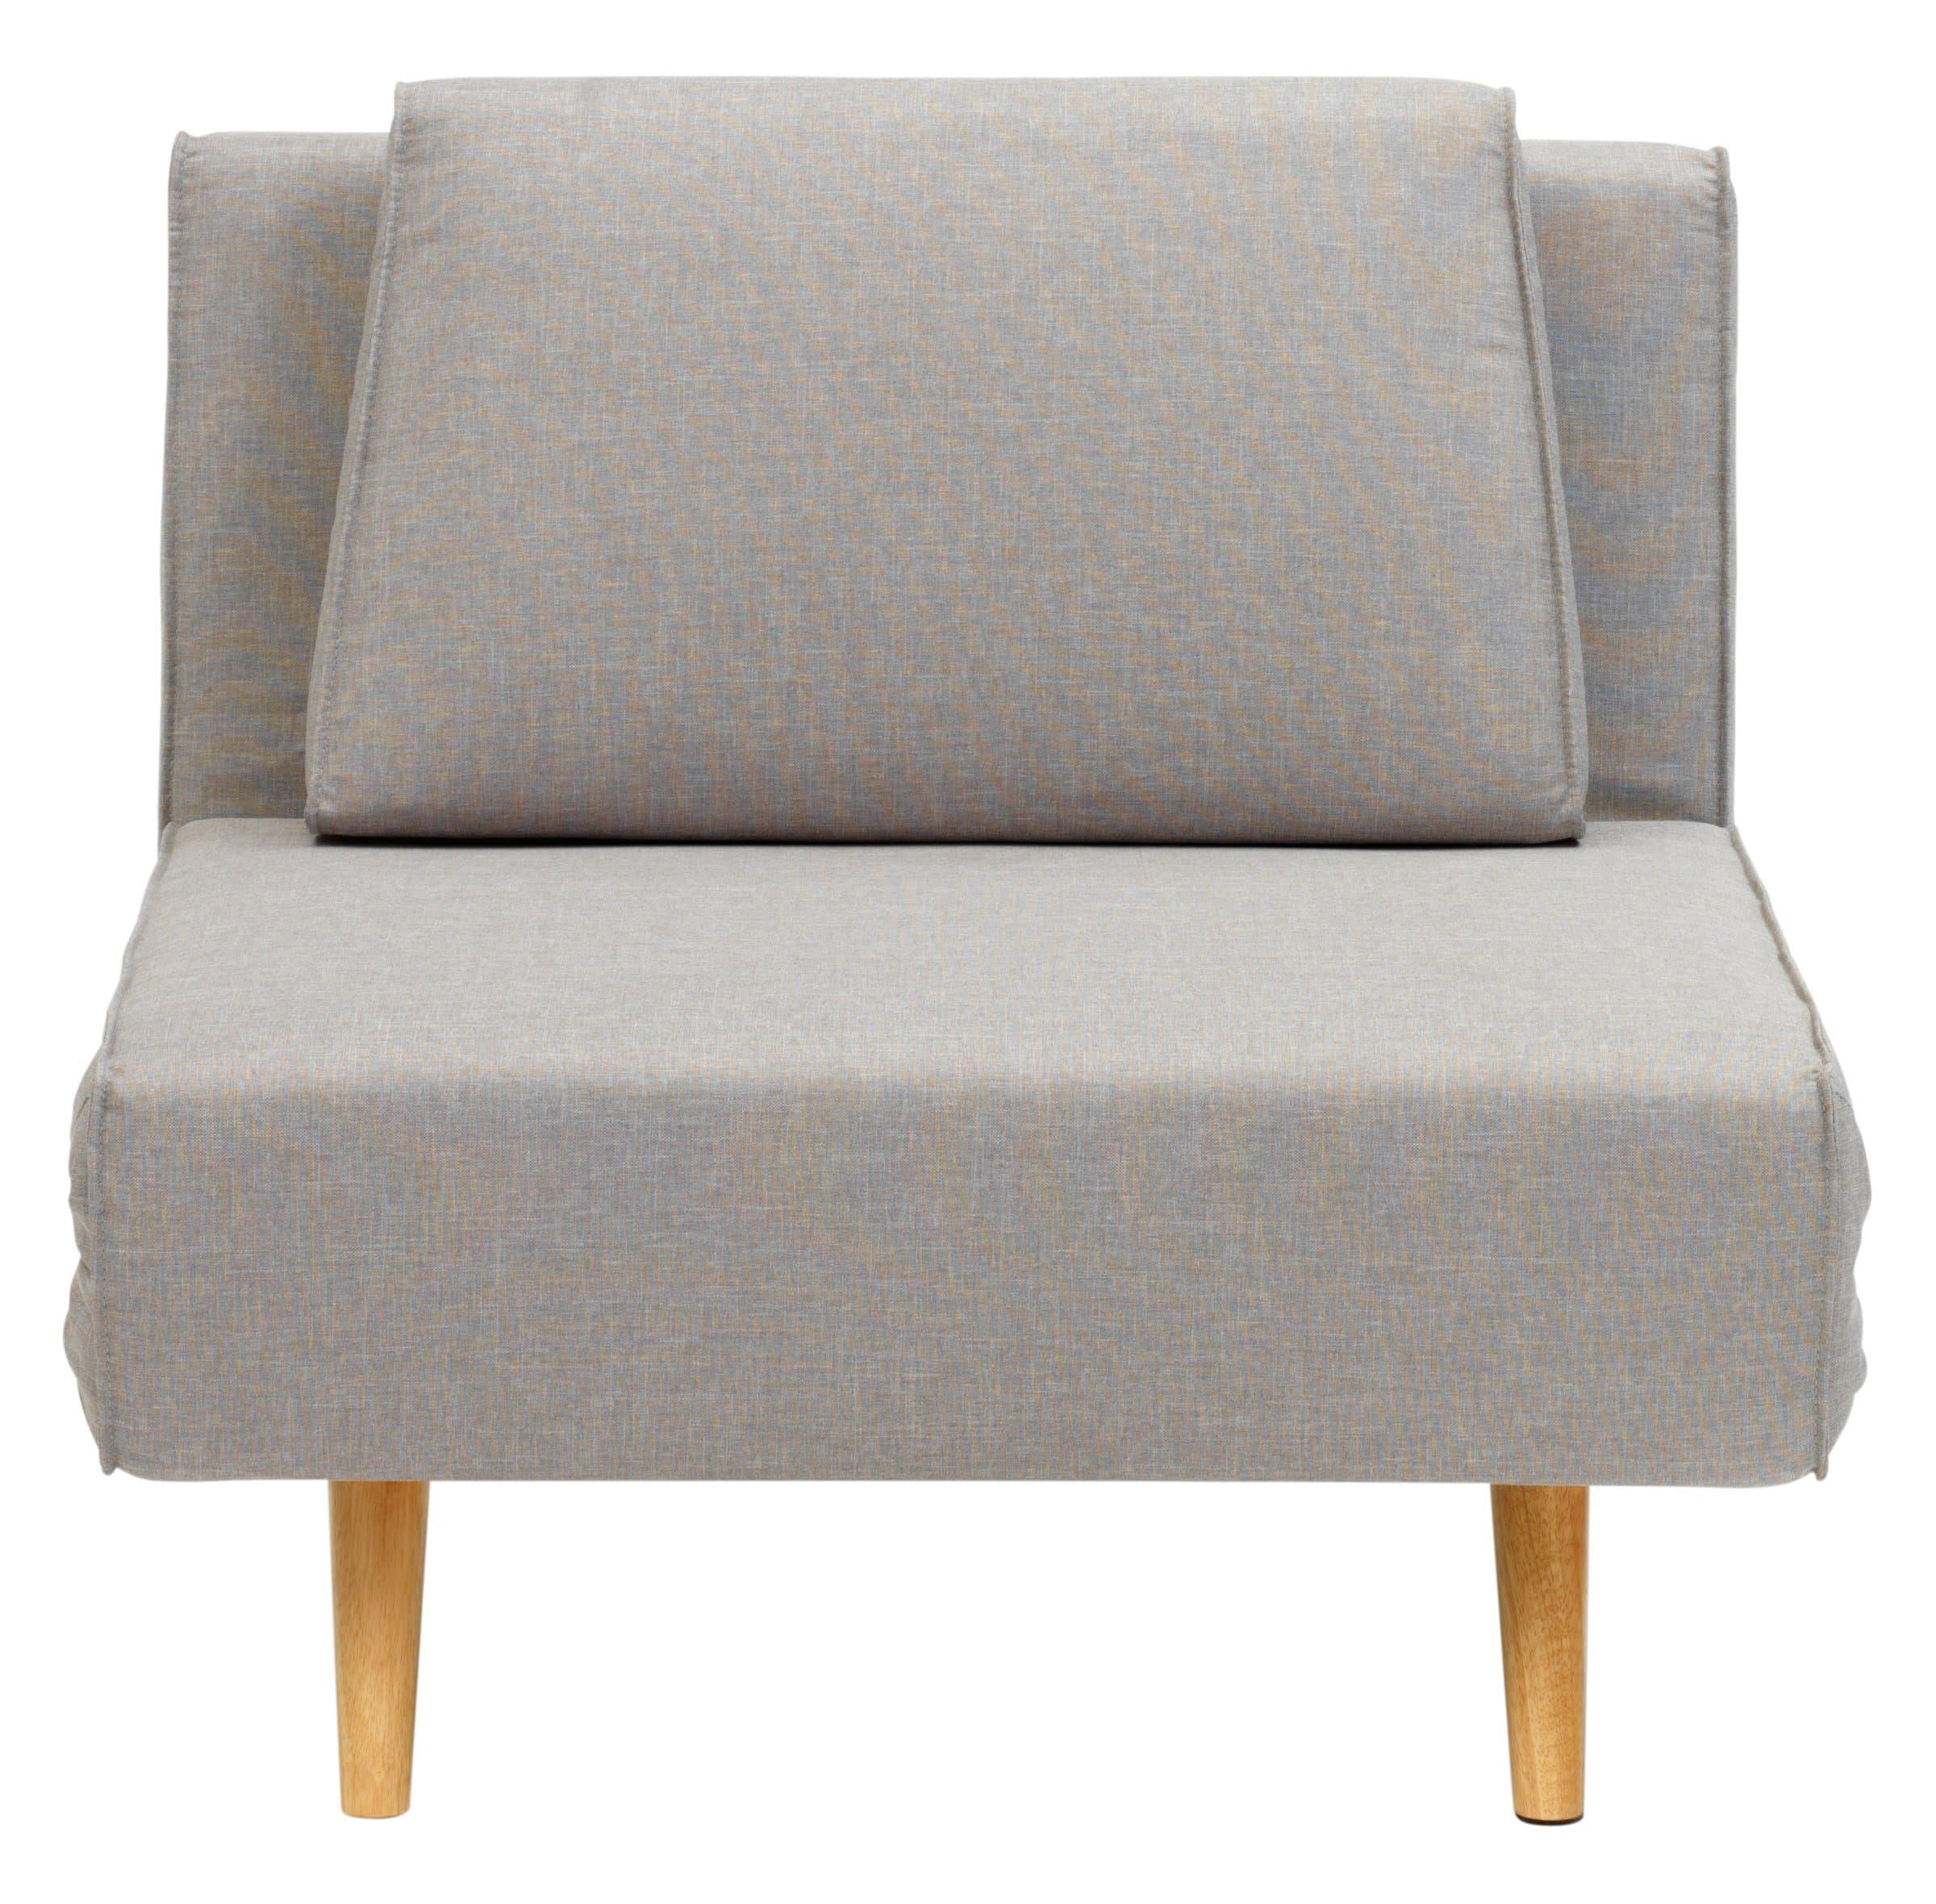 bettsofa henni migros. Black Bedroom Furniture Sets. Home Design Ideas